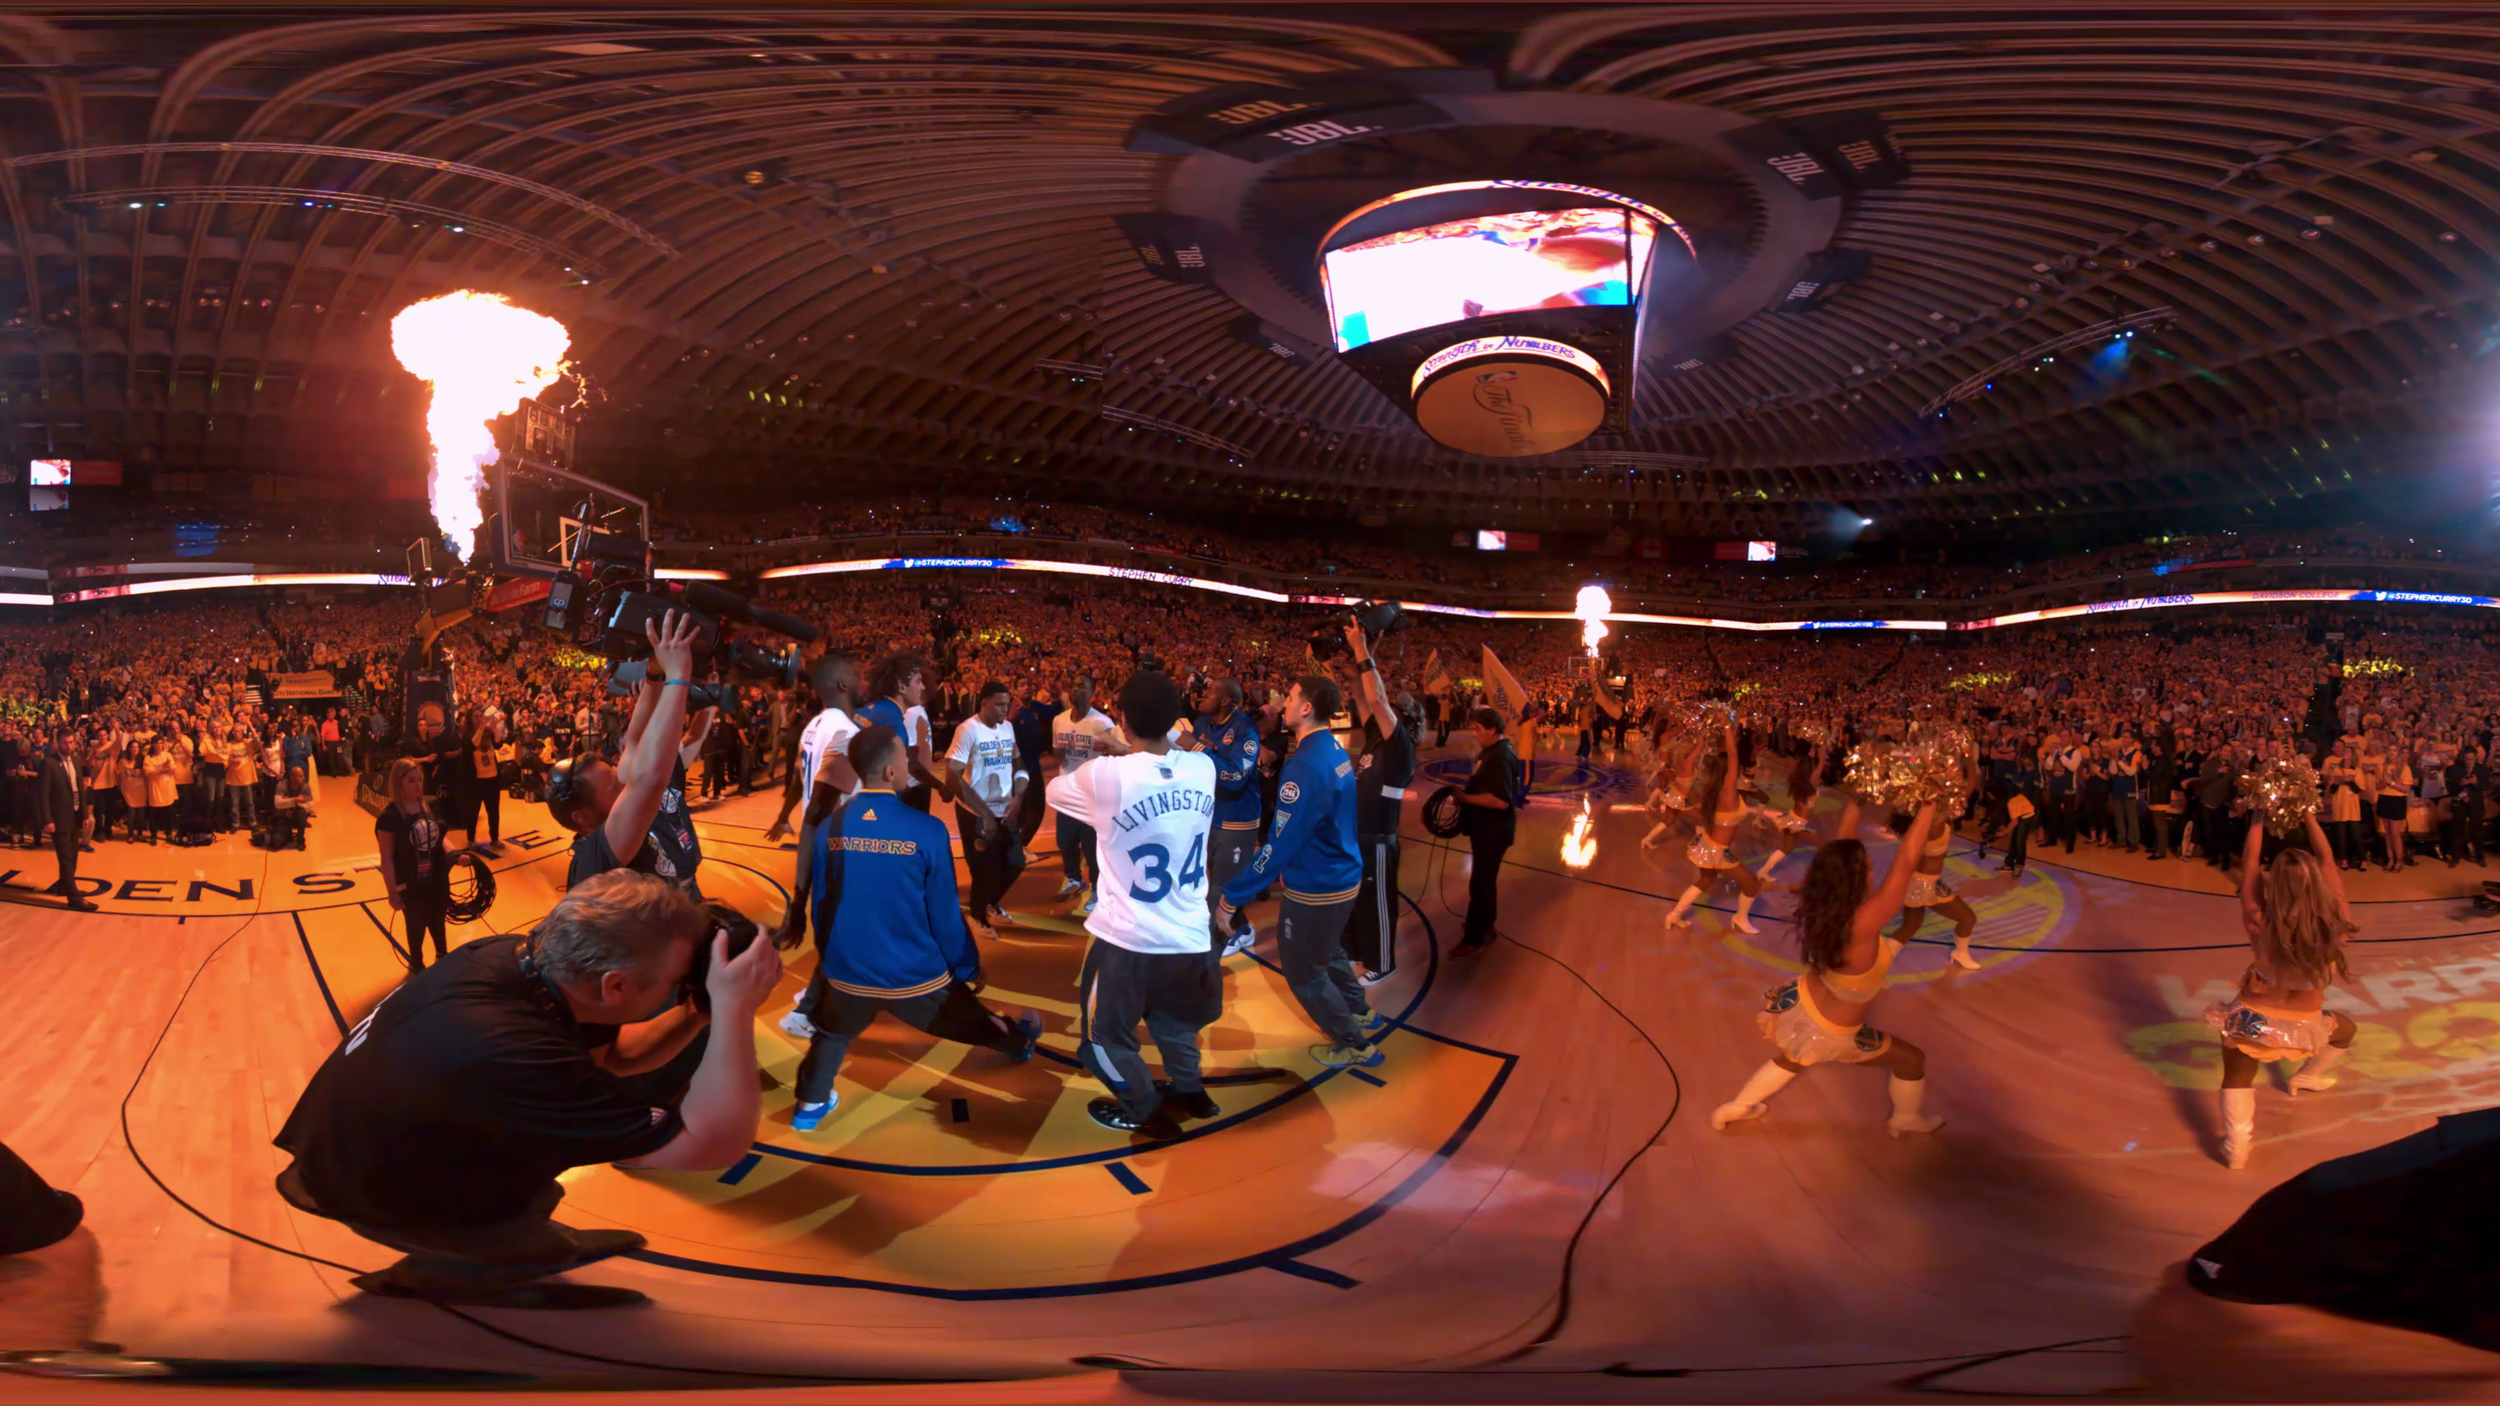 FOLLOW MY LEAD: THE 2016 NBA FINALS -